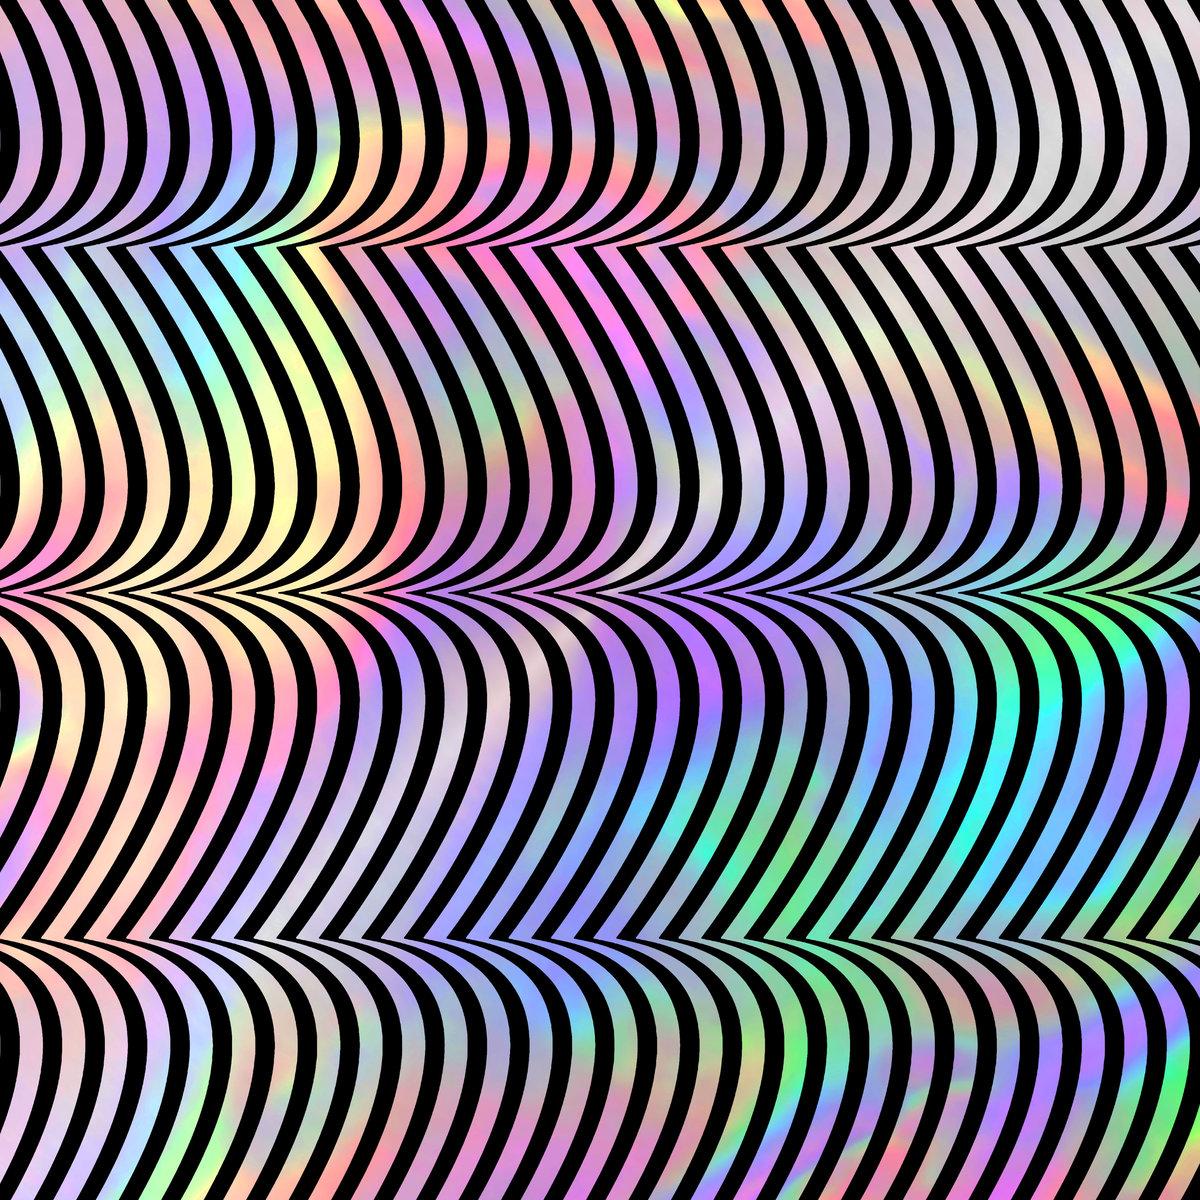 Merzbow - Pulse Demon [2xLP]